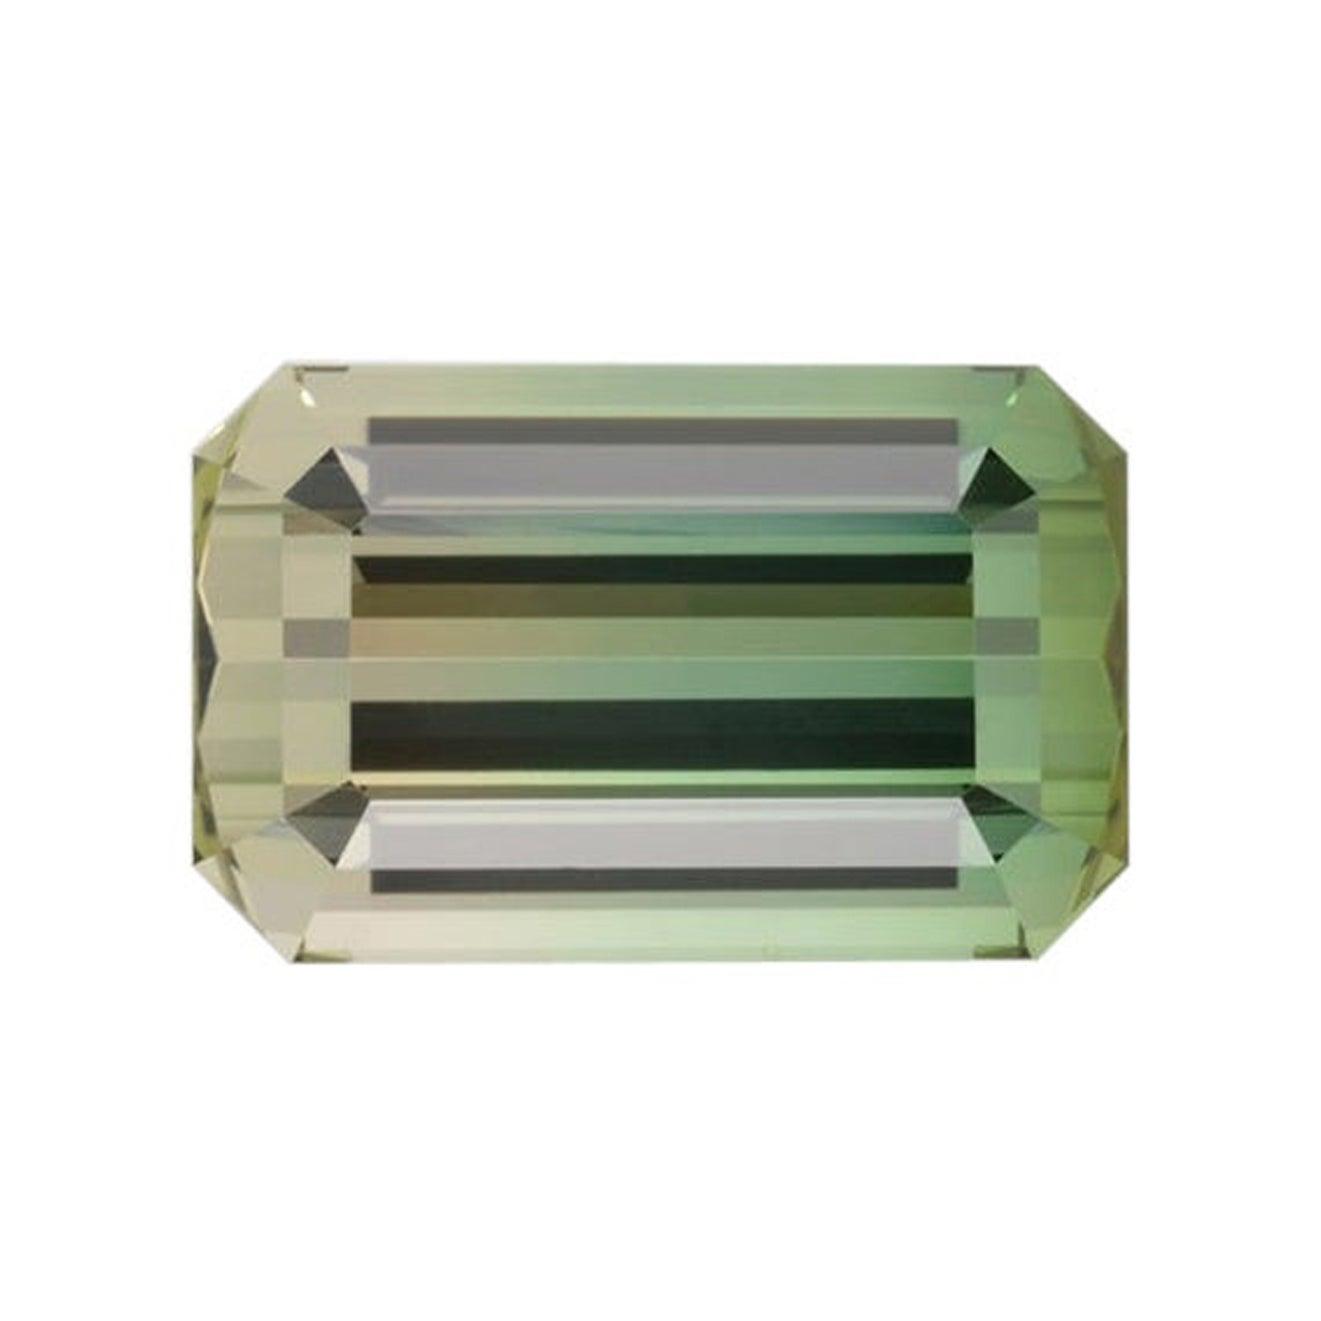 Bicolor Tourmaline Ring Gem 17.68 Carat Emerald Cut Loose Gemstone